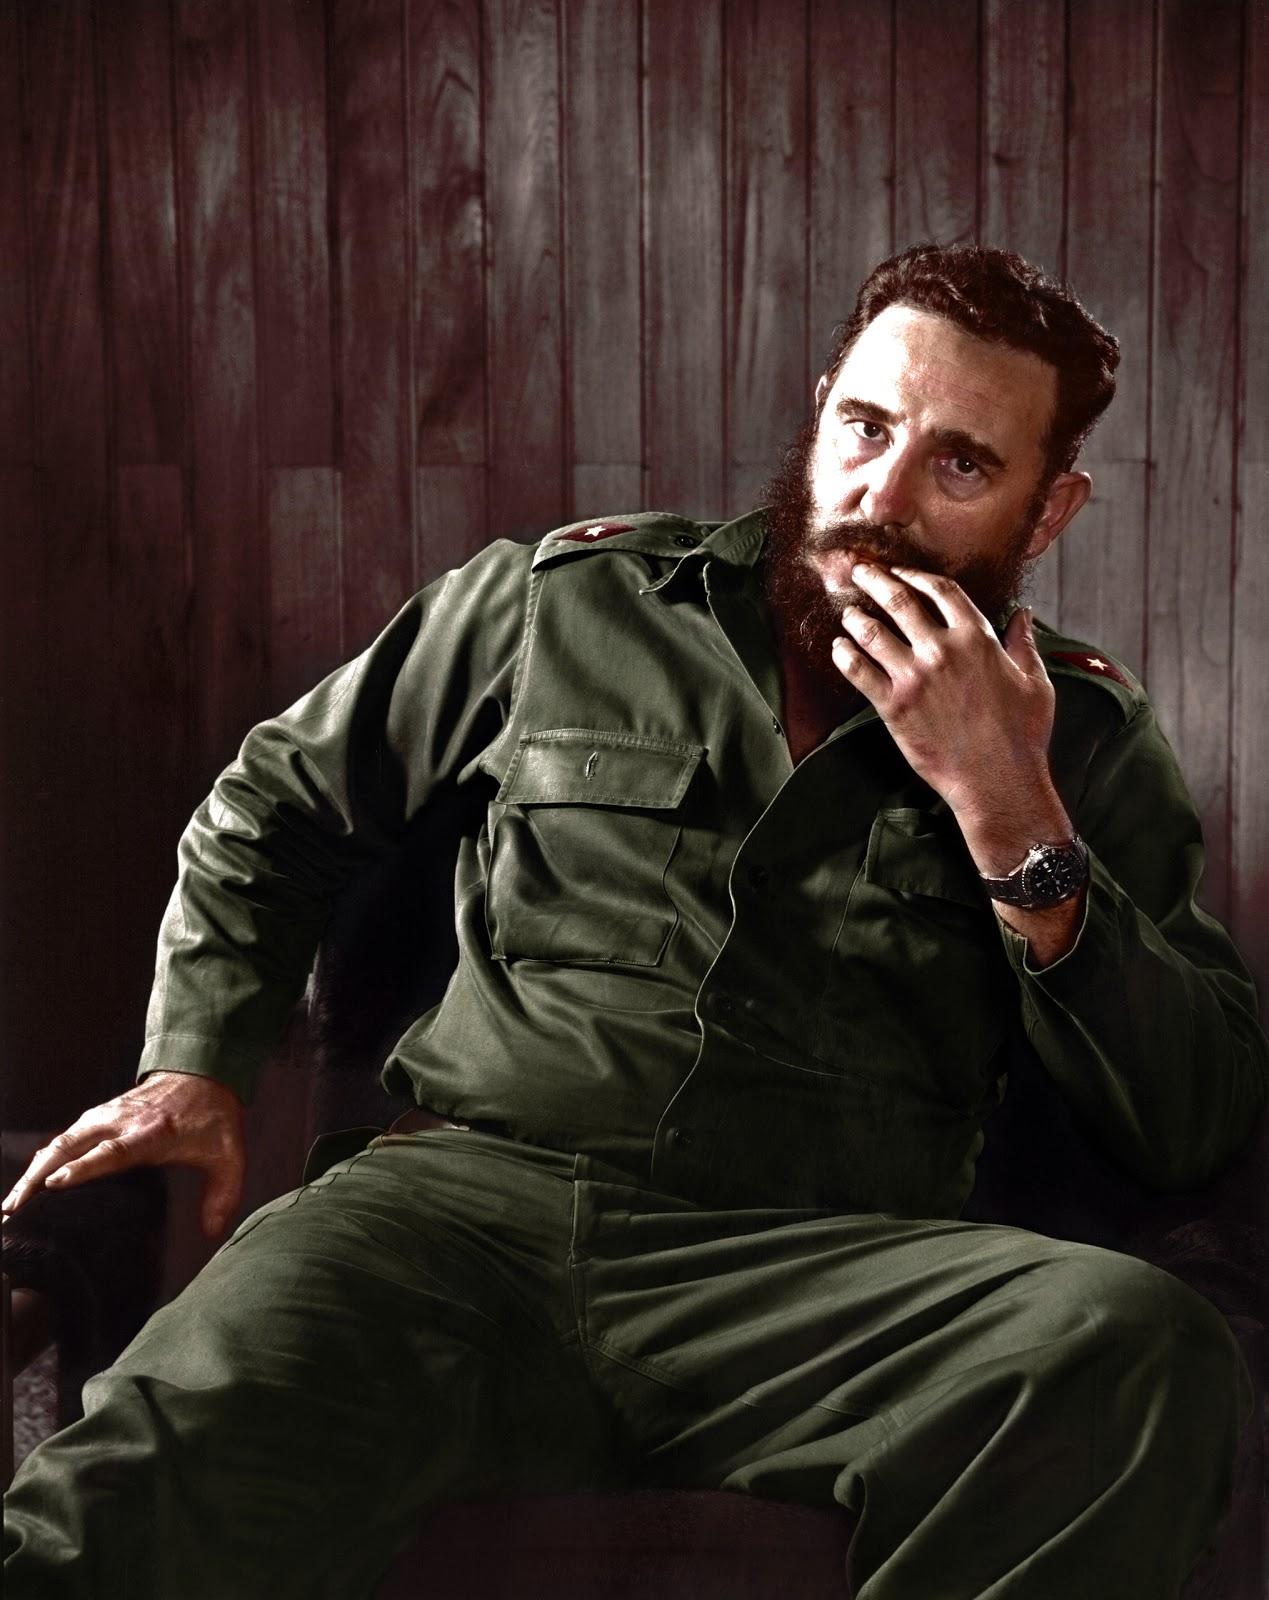 Fidel-Castro-Rolex-GMT-Master-Reference-